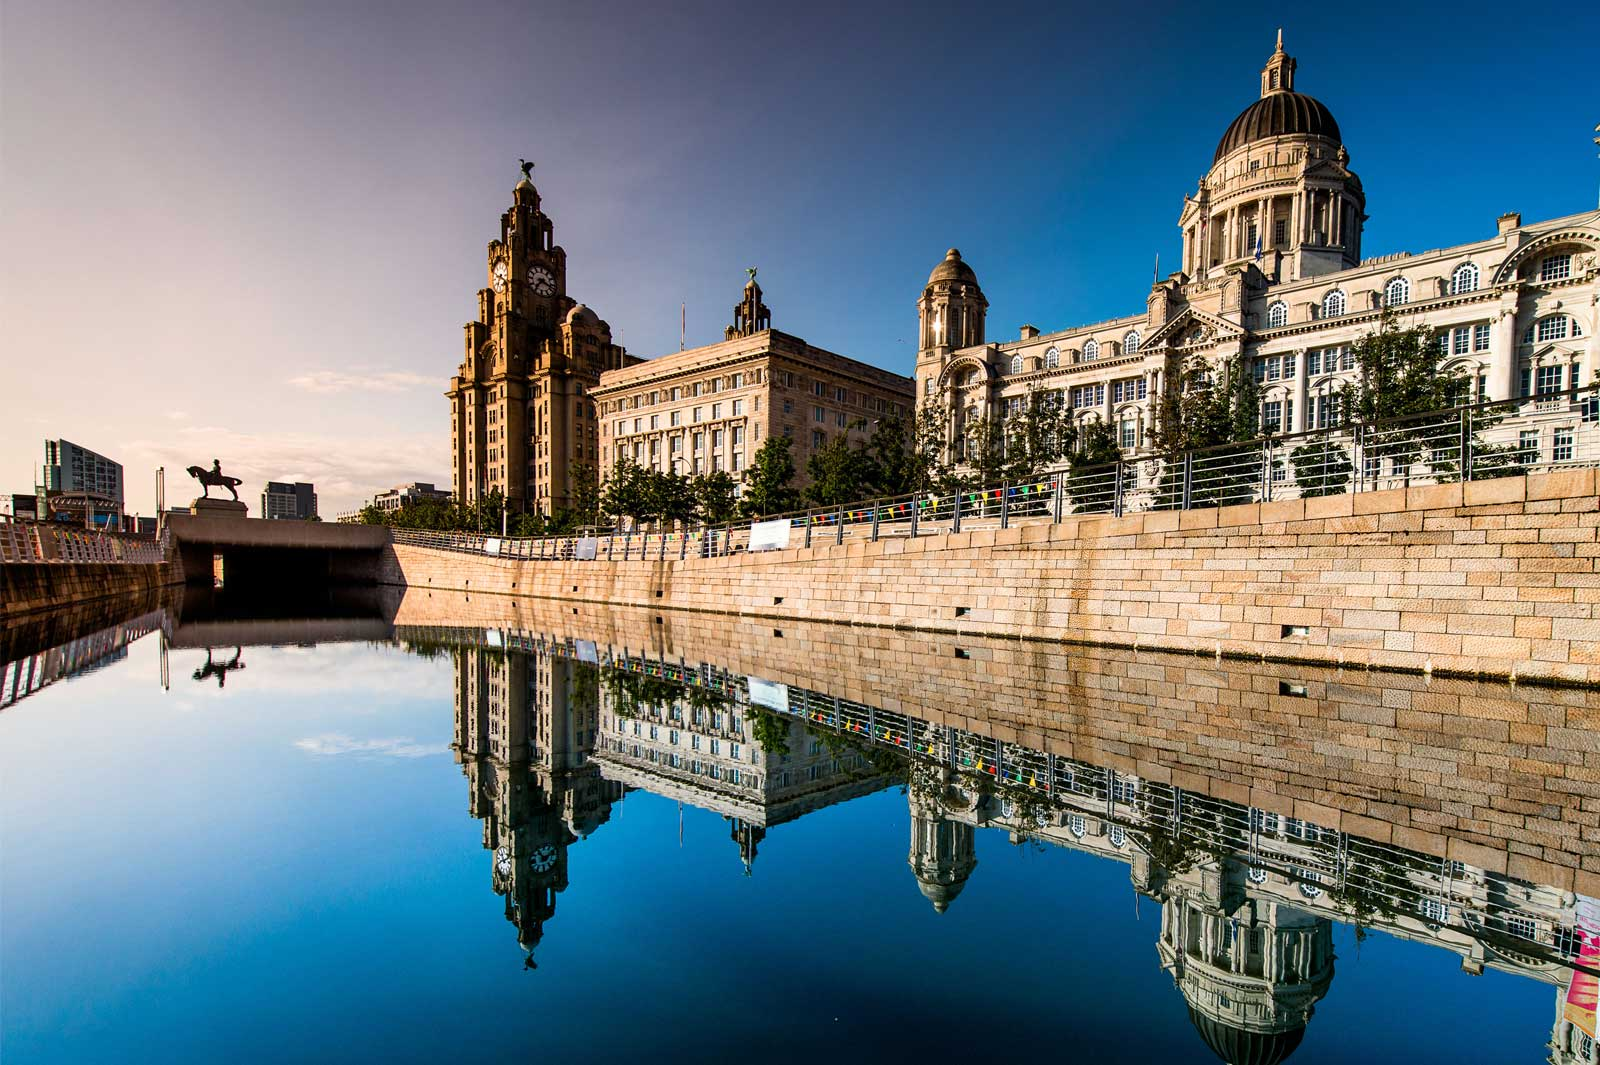 Pierhead Liverpool